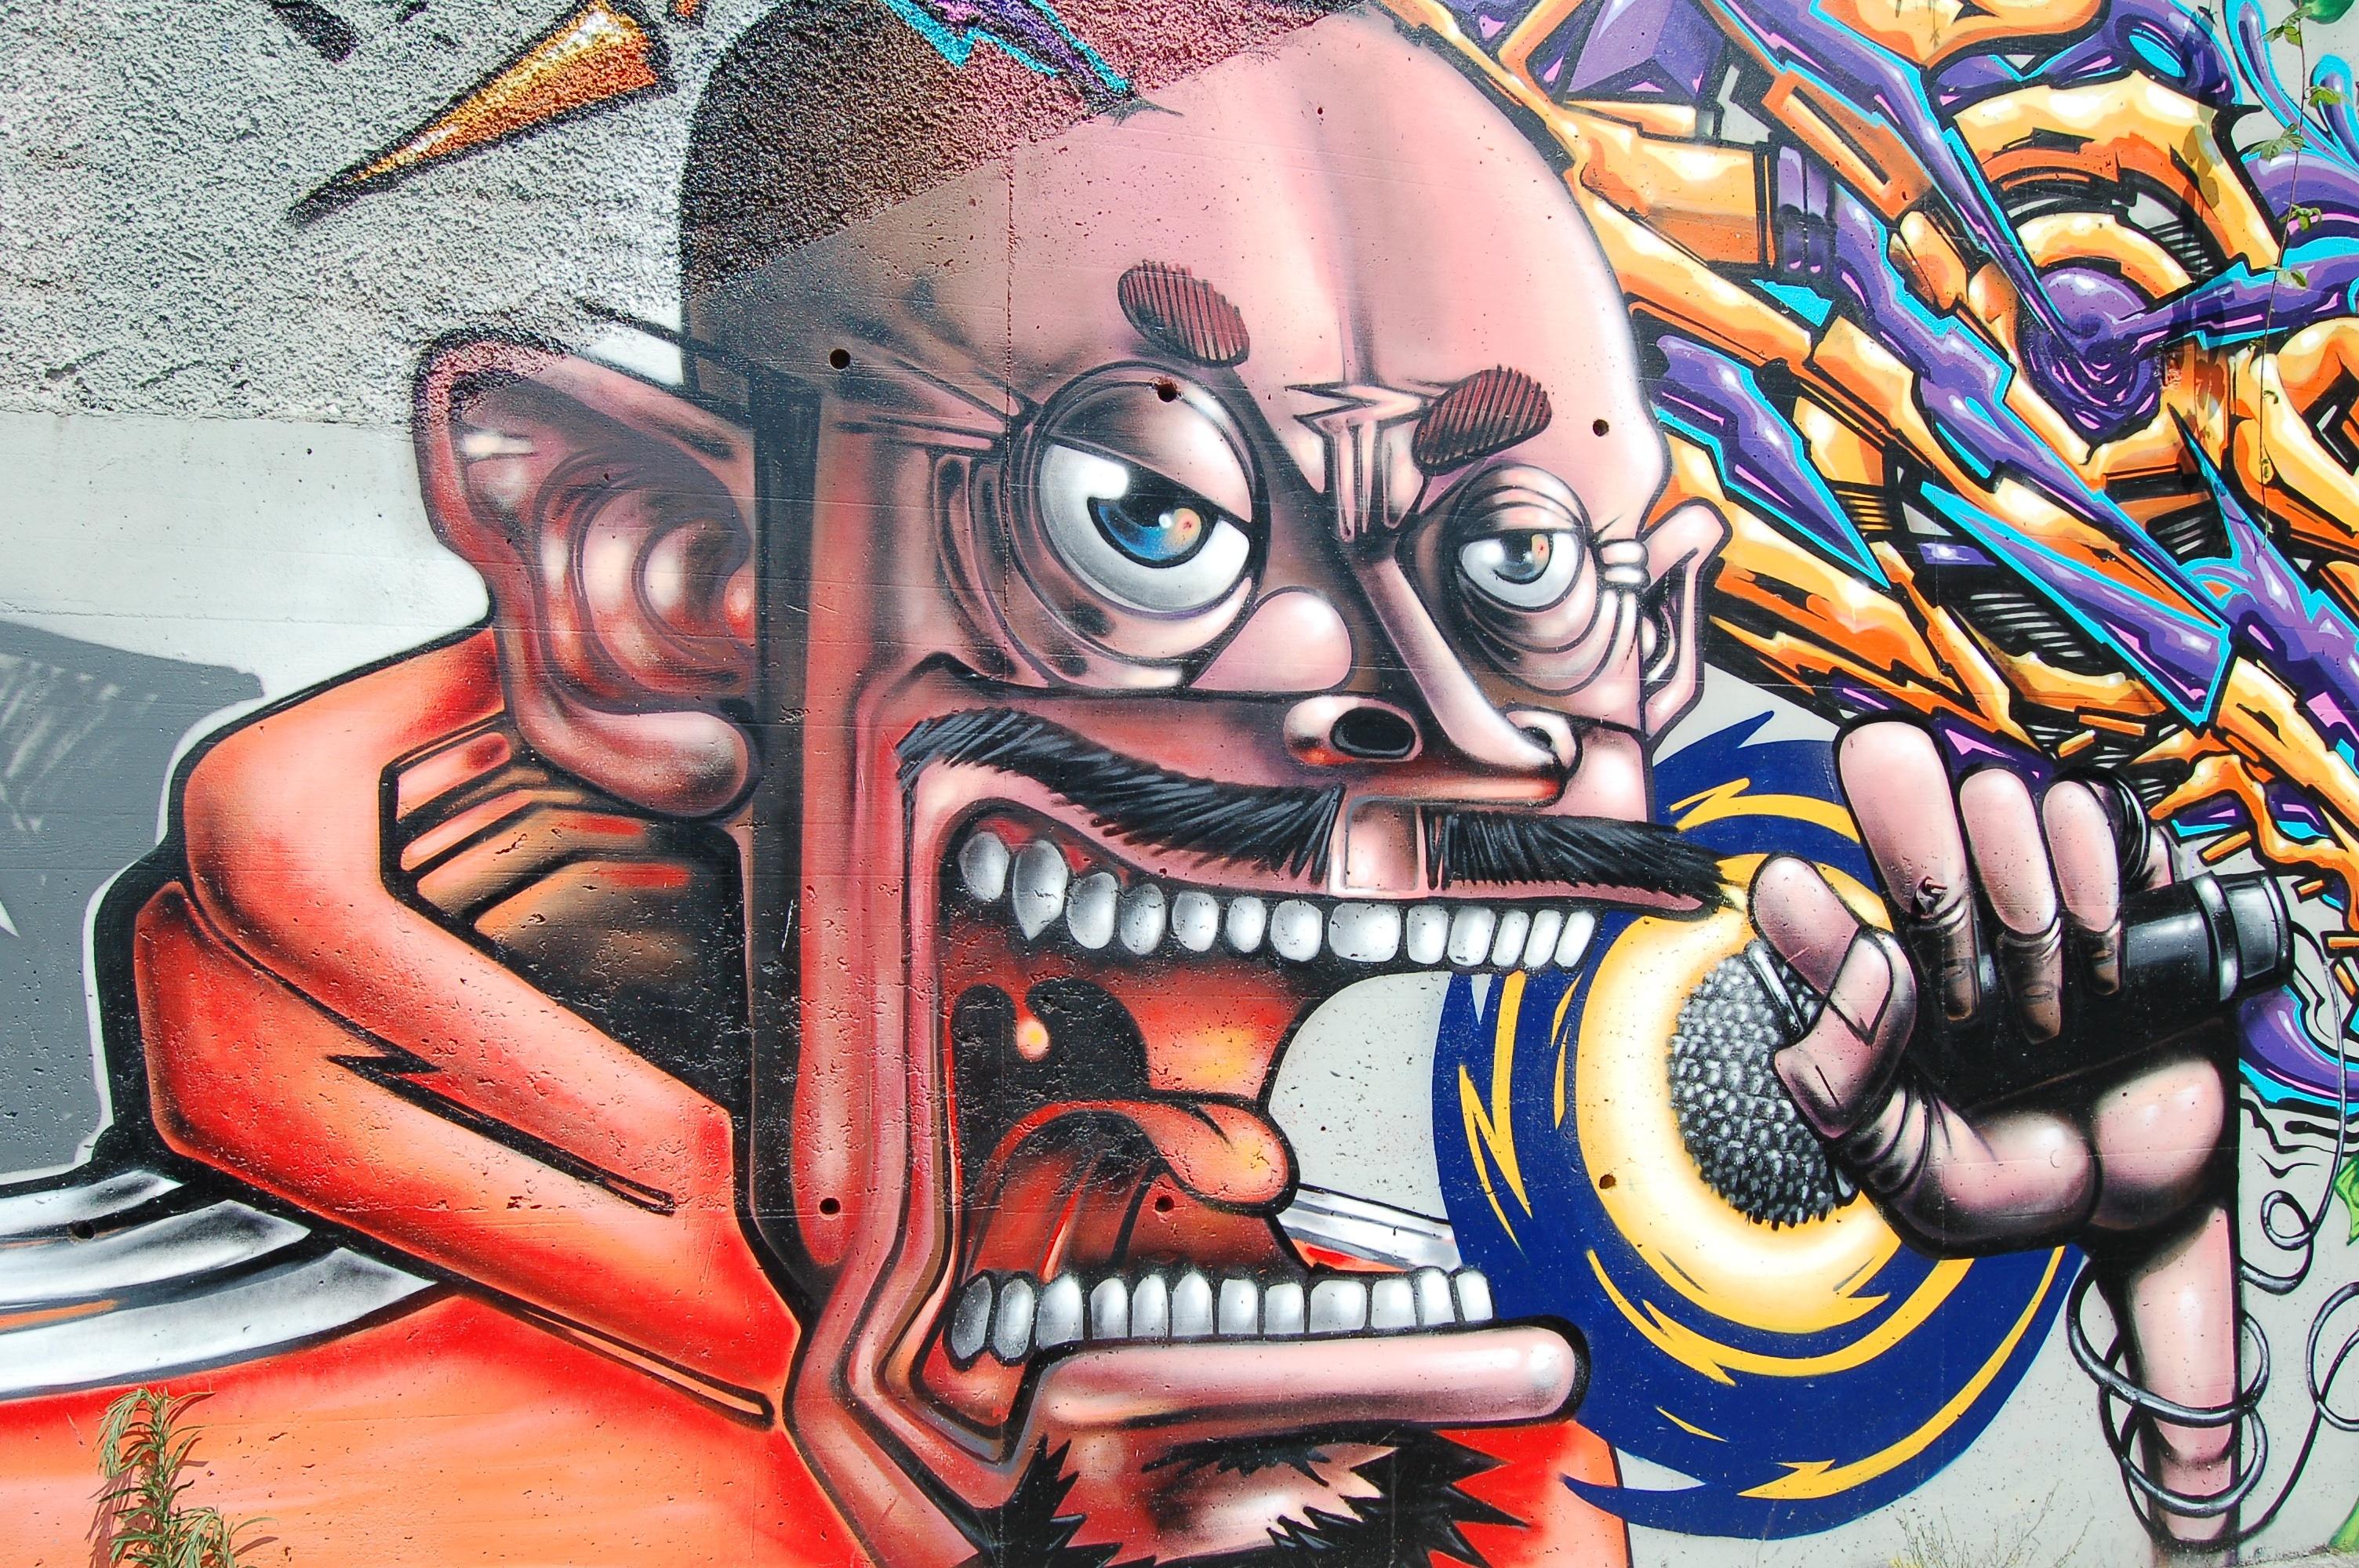 Gambar Coretan Seni Jalanan Ilustrasi Lukisan Dinding Gambar